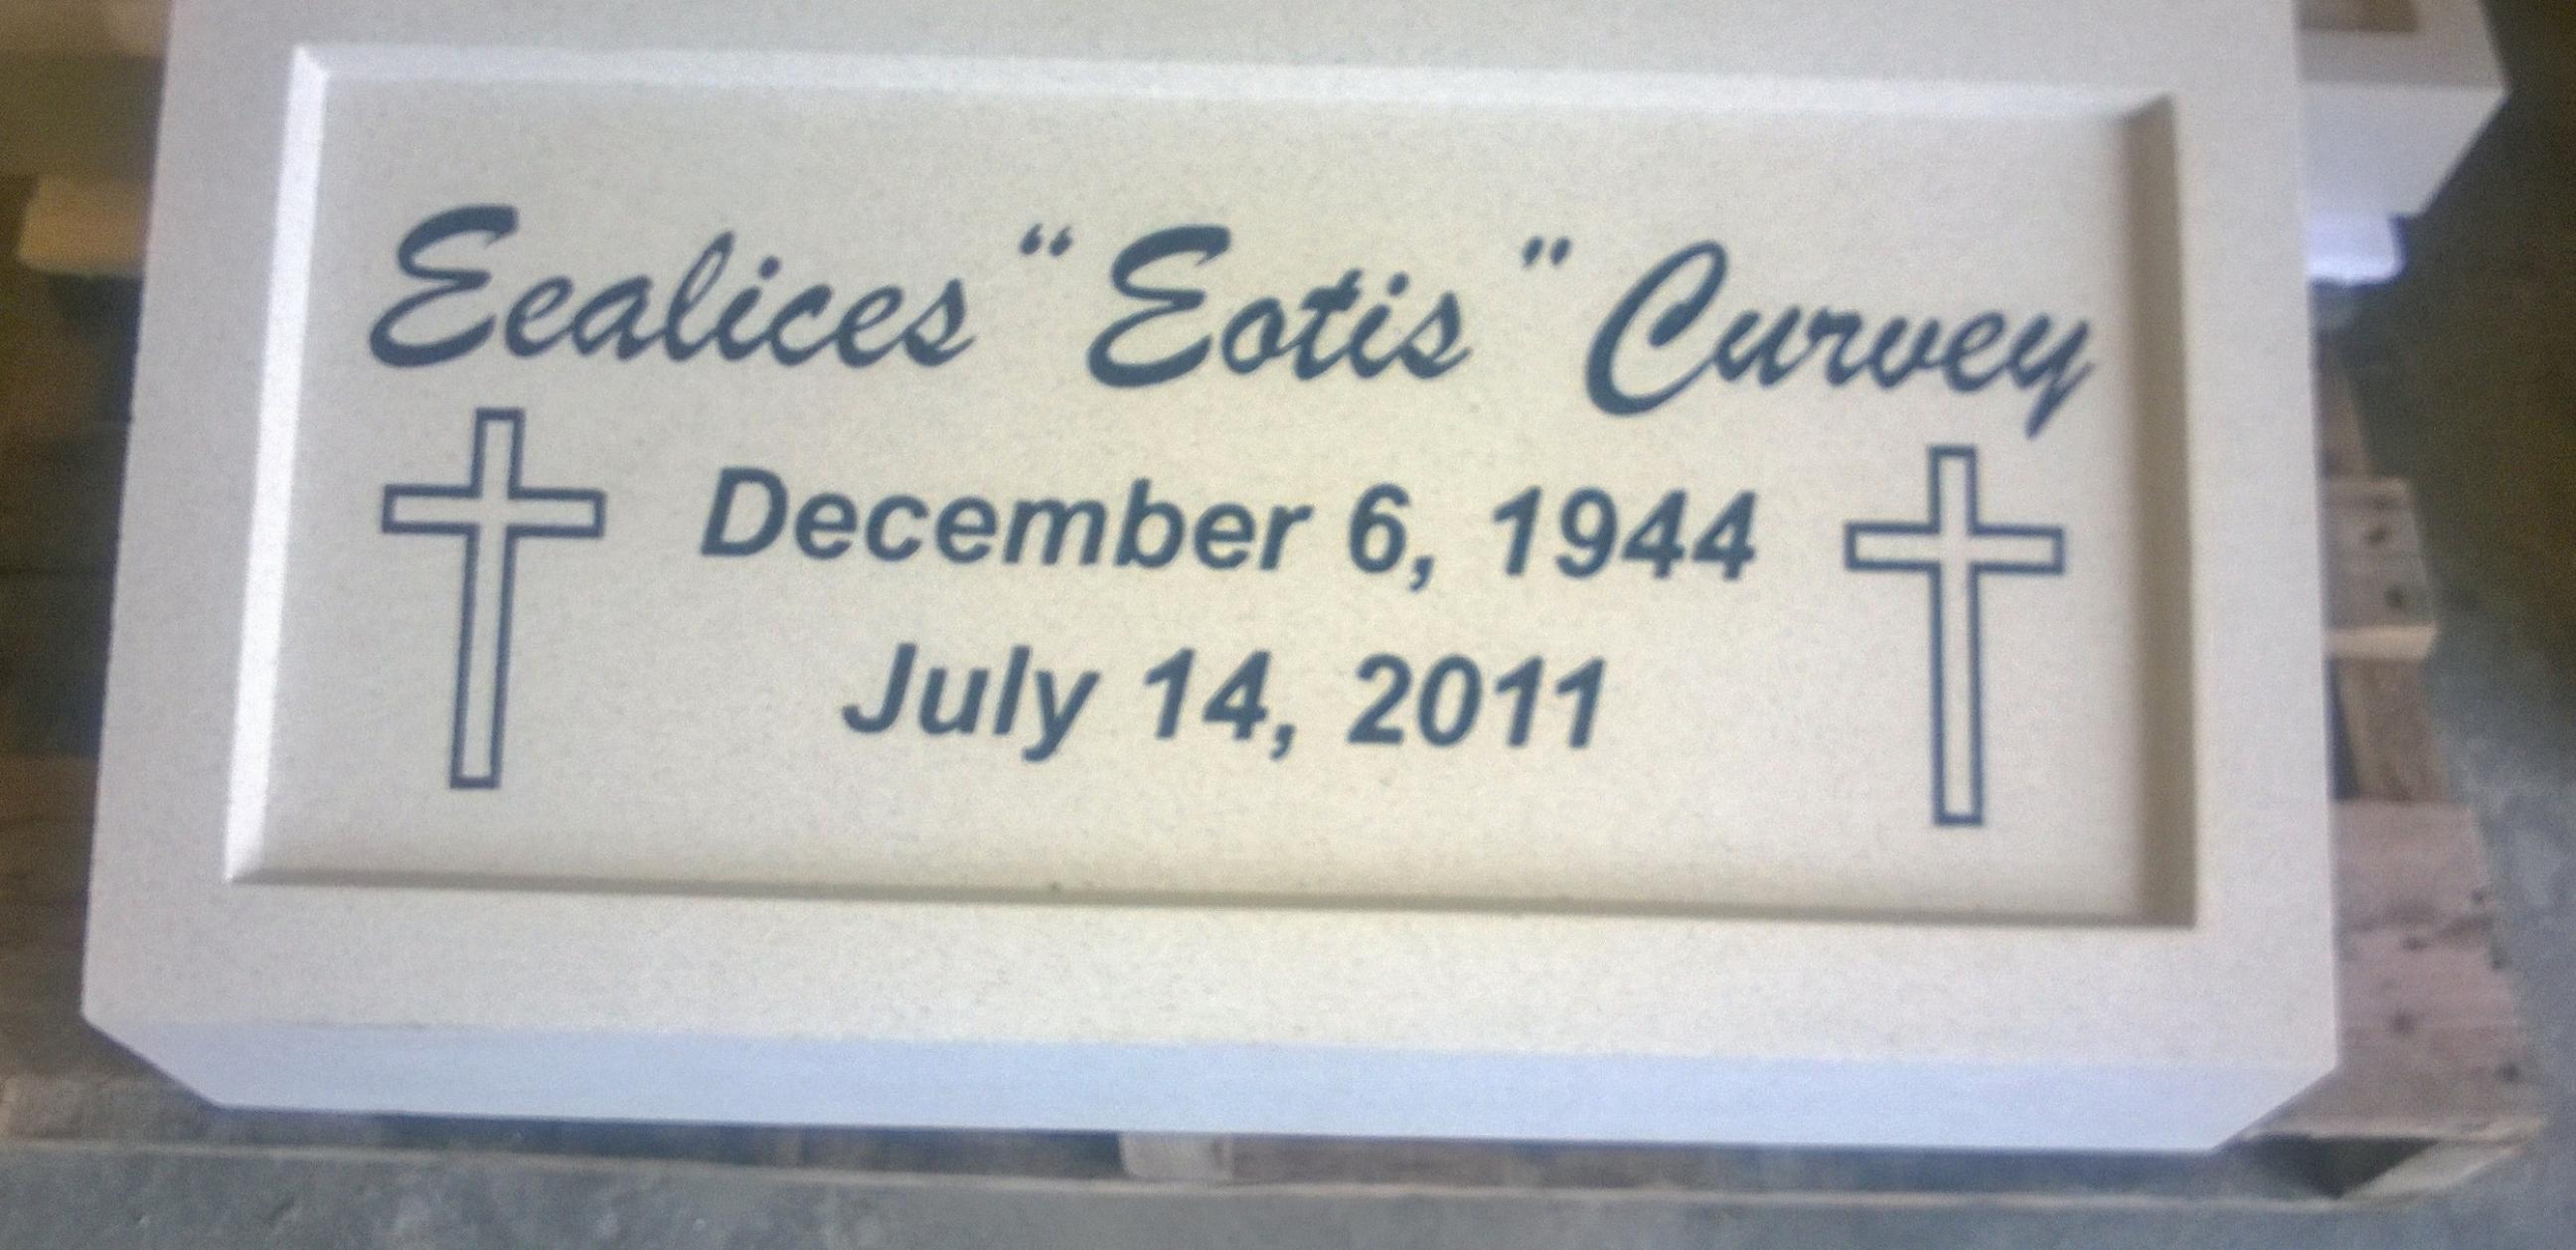 Ealices Eotis Curvey